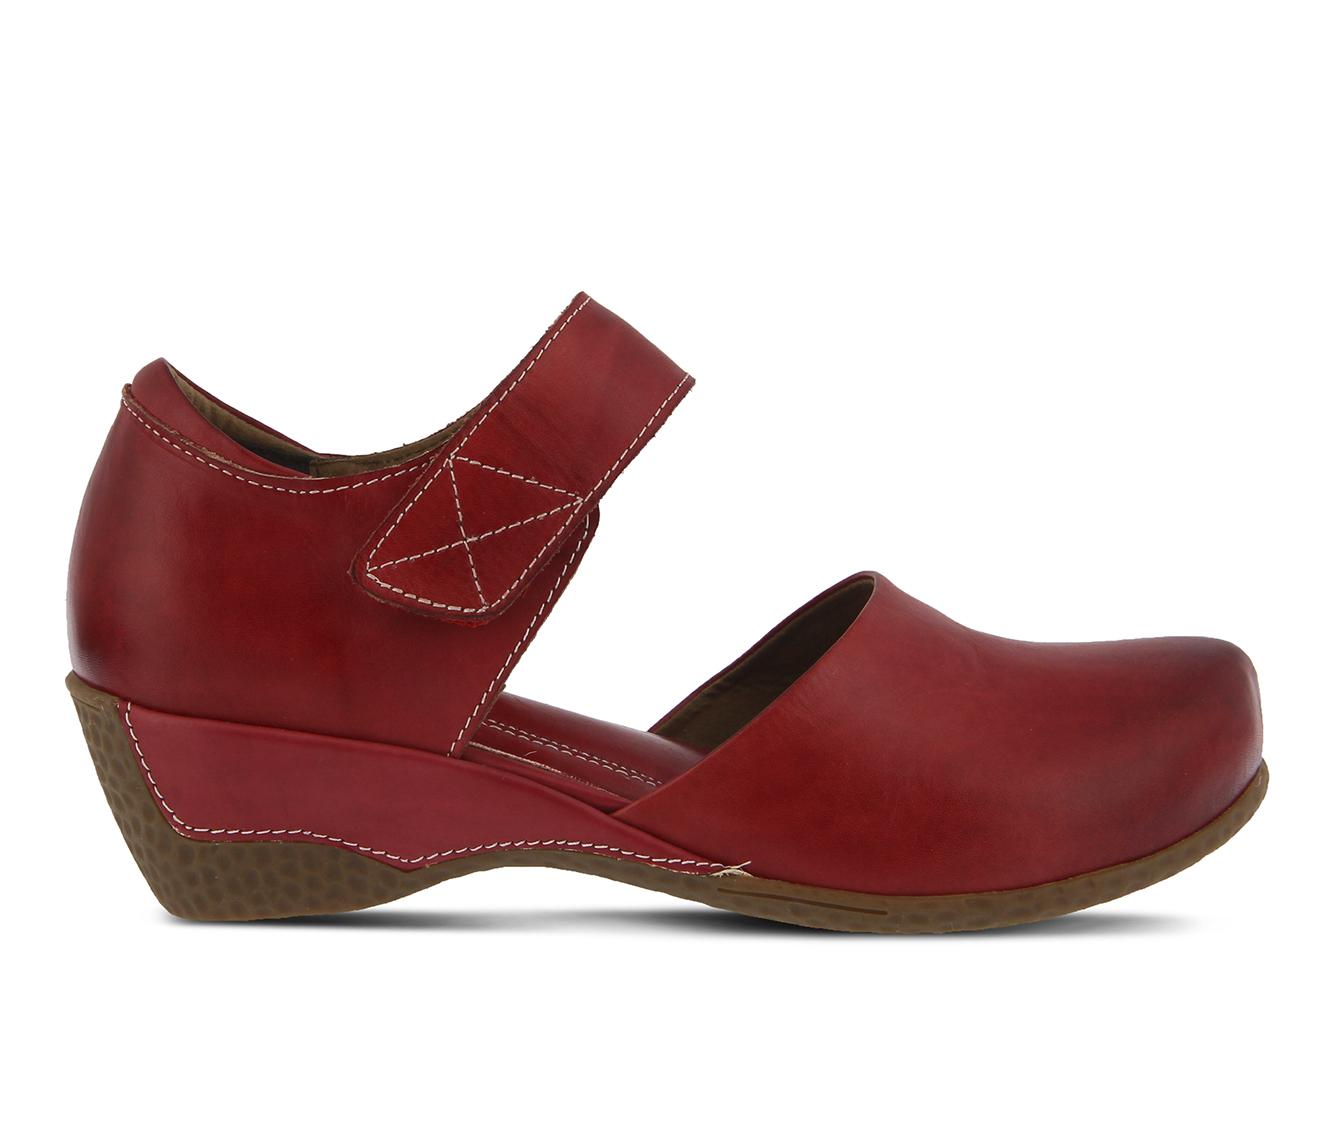 L'Artiste Gloss Women's Shoe (Red Leather)